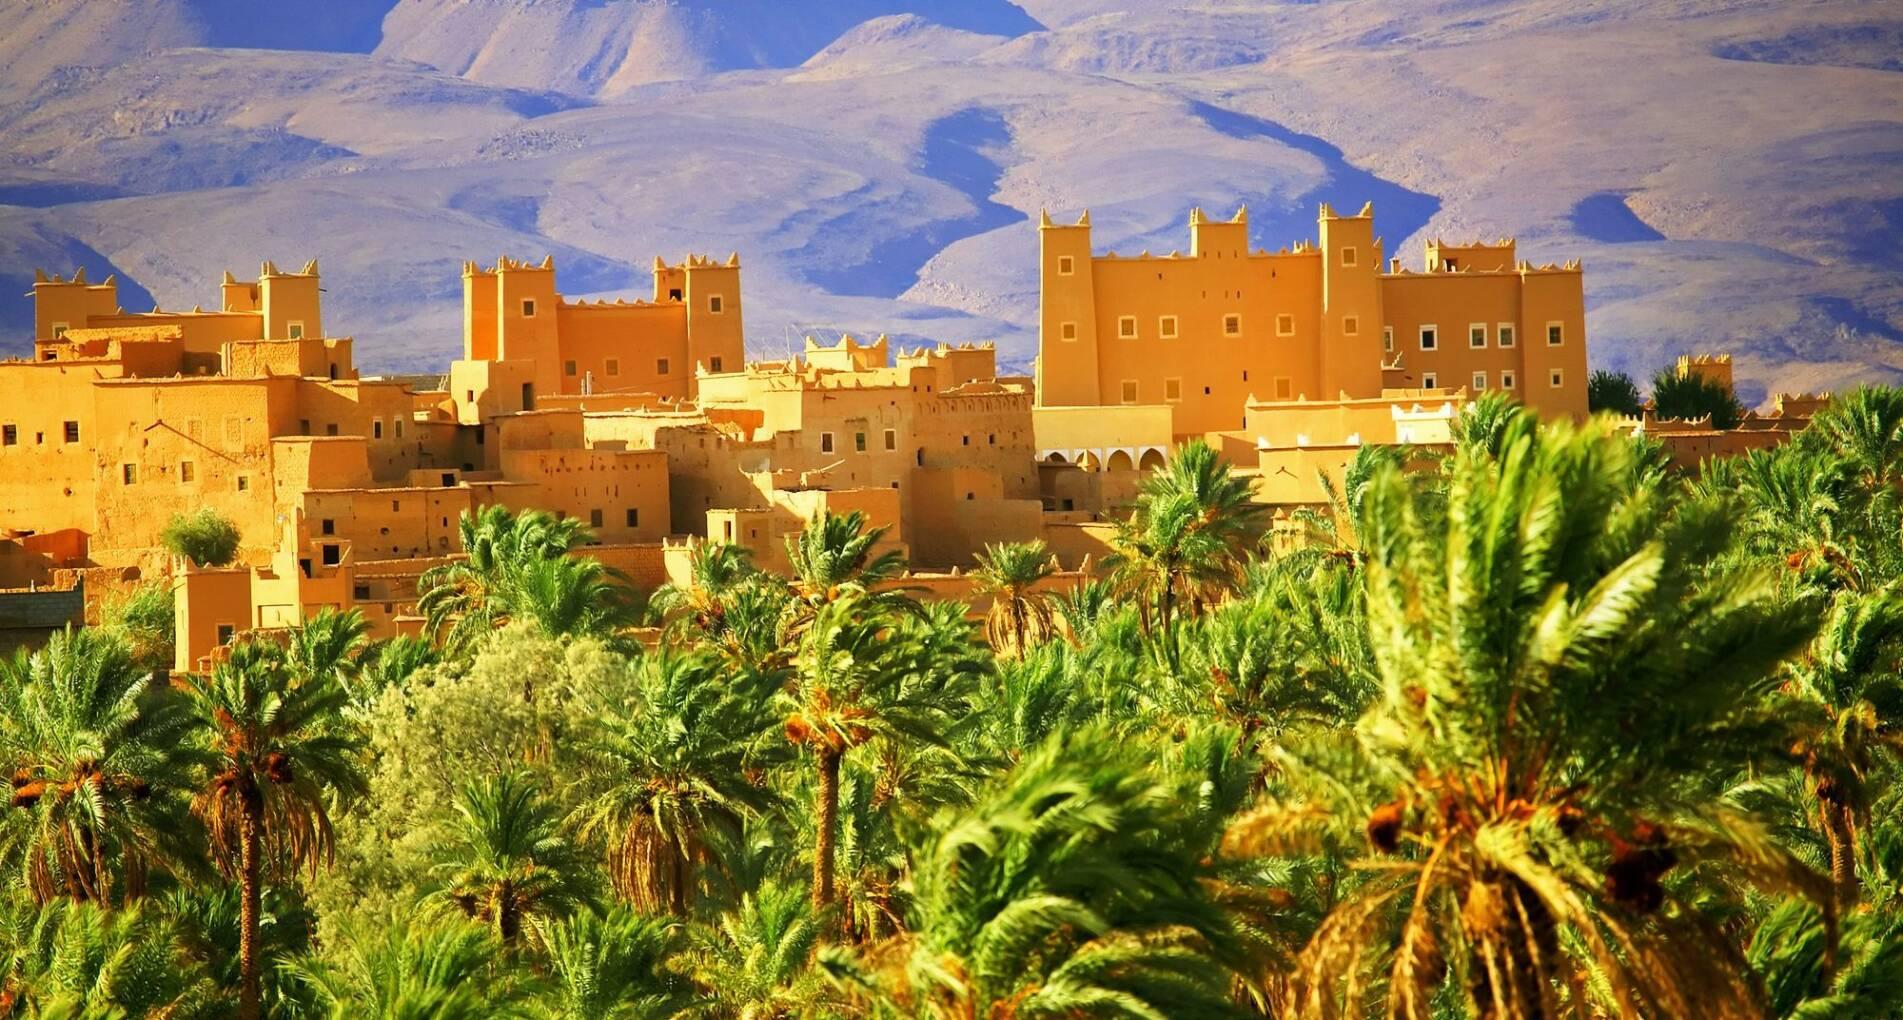 Fly & Drive Marokko: Koningssteden, kasbah's en Atlasgebergte - Marokko - 1